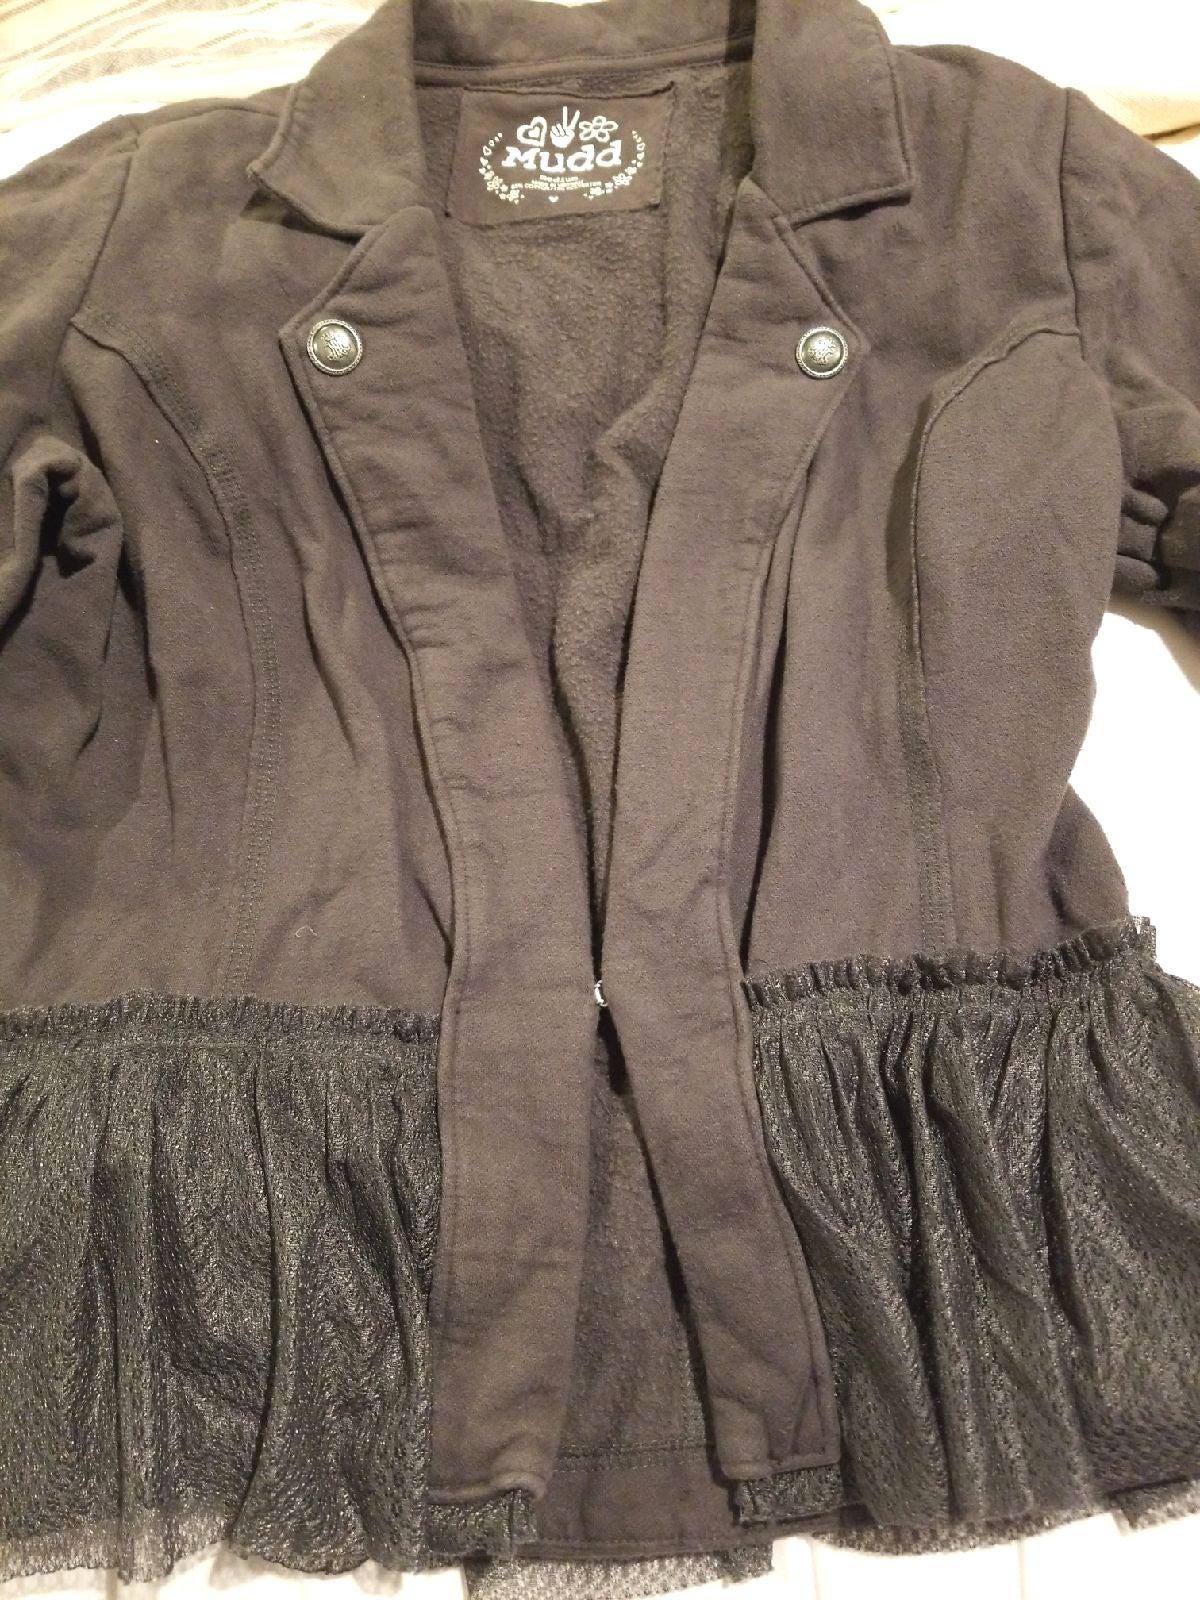 Mudd fleece knit peplum ruffle blazer